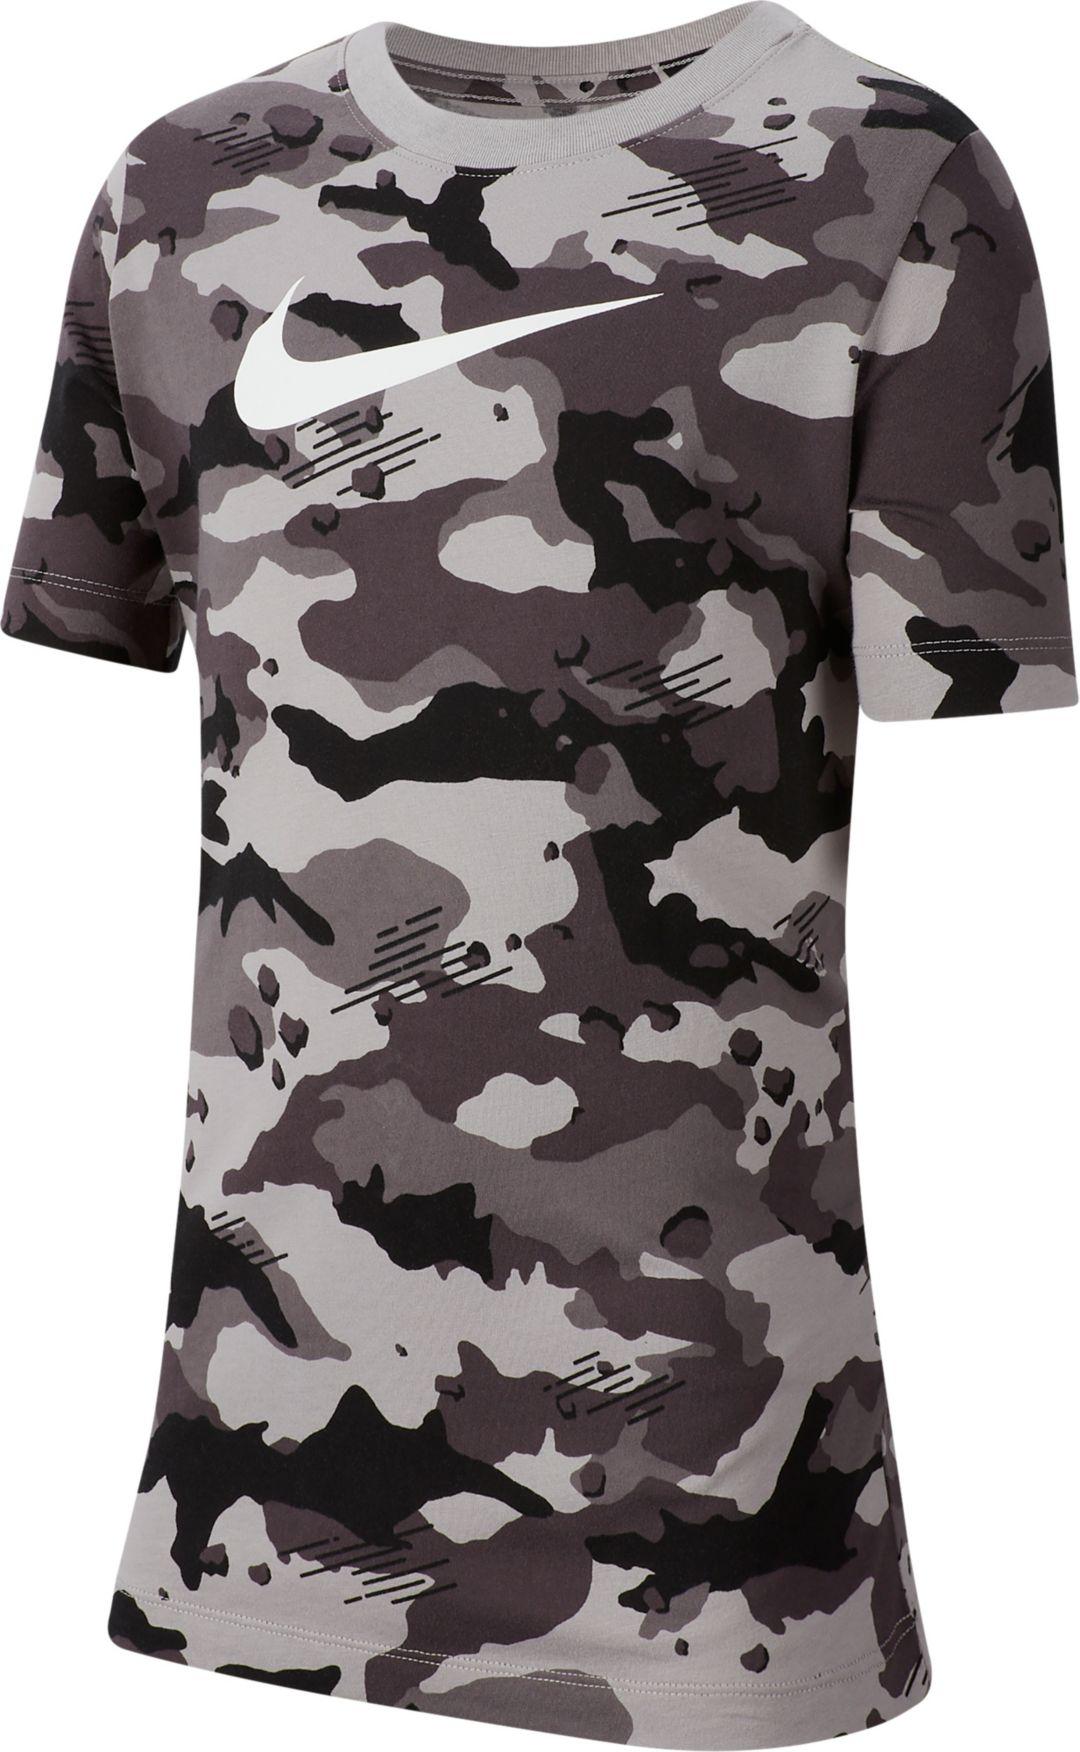 ce43bf59f Nike Boys' Sportswear Camo Allover Print Graphic Tee | DICK'S ...